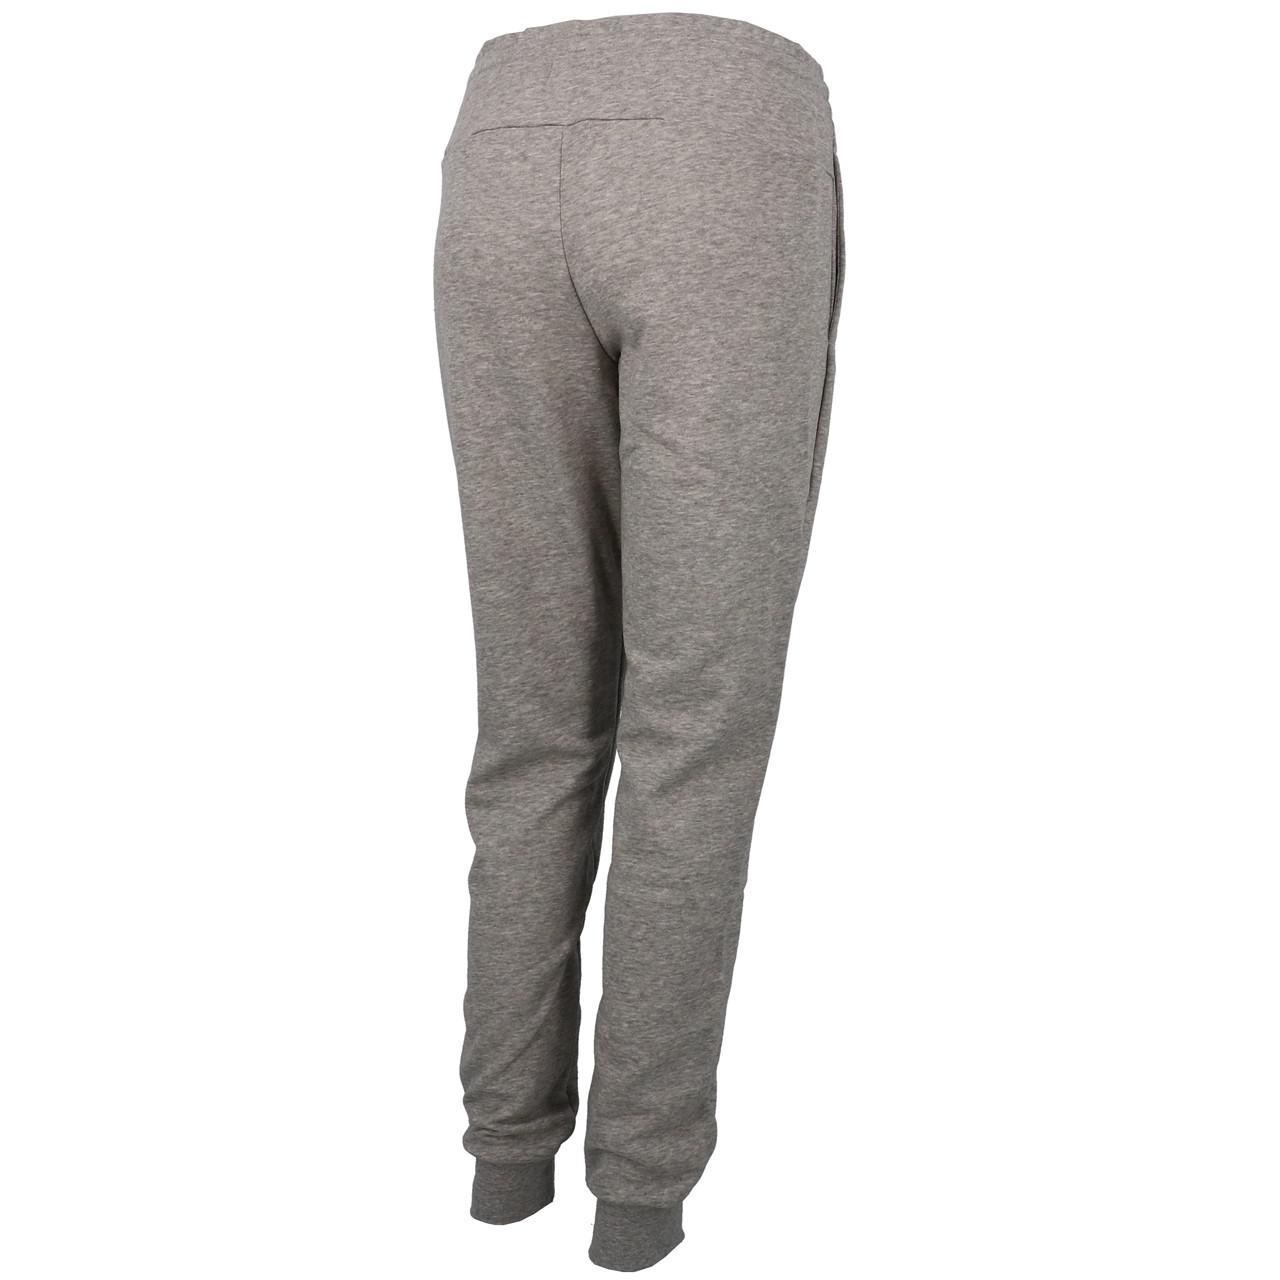 Pantalon-de-survetement-Adidas-E-pln-pant-grey-mel-l-Gris-18973-Neuf miniature 5